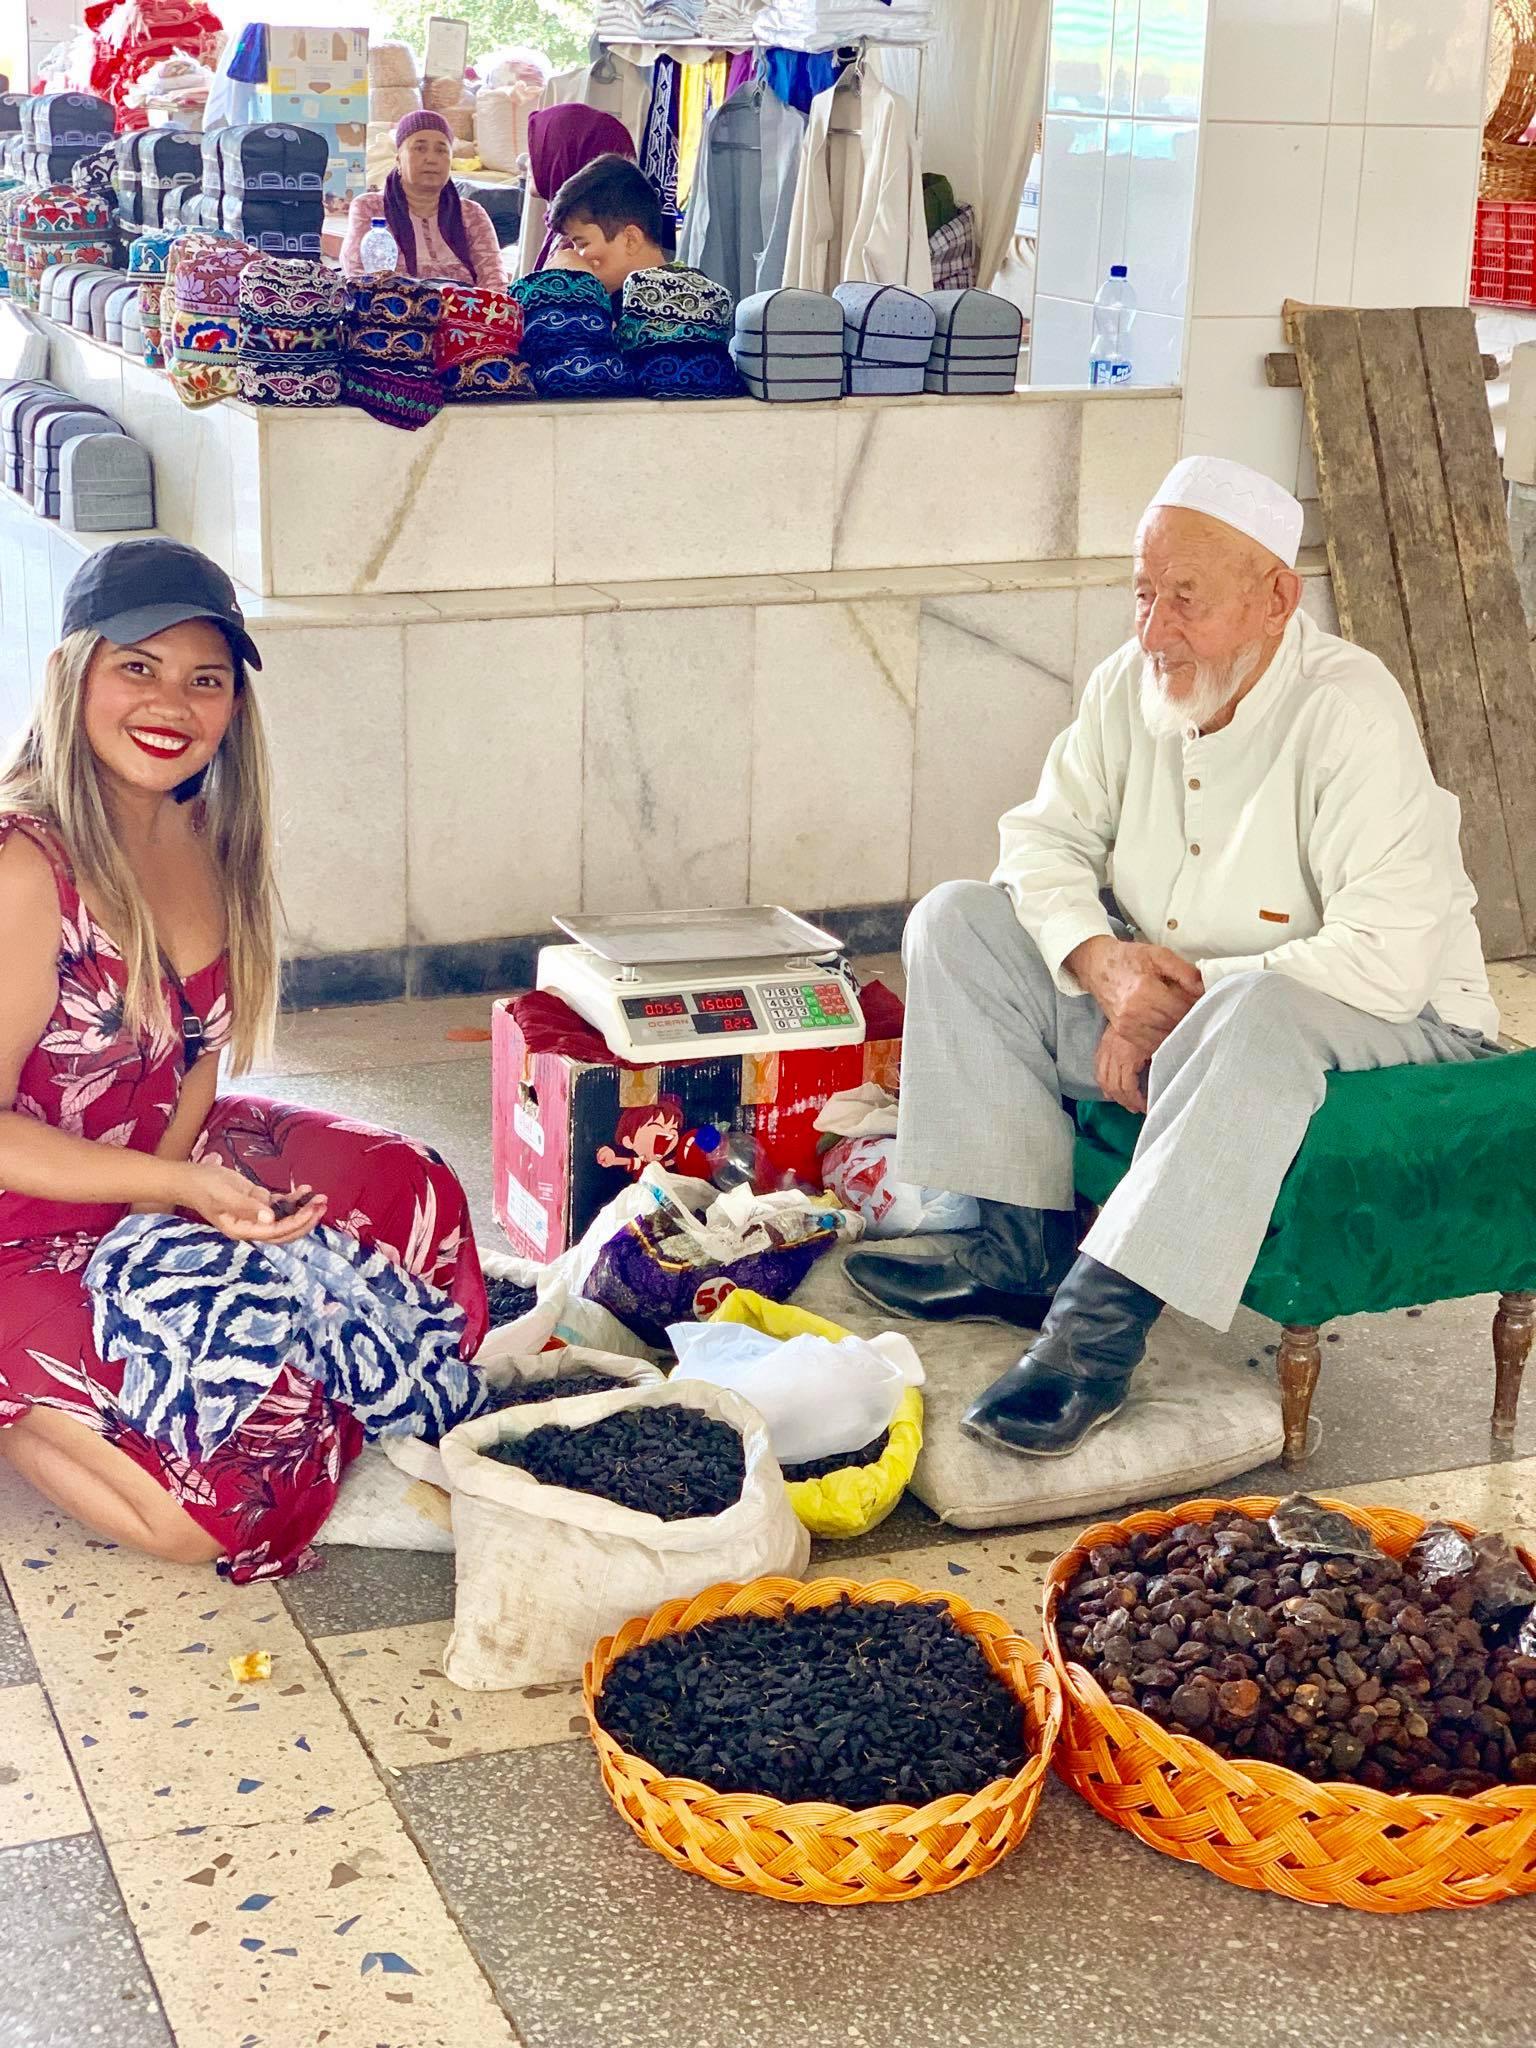 Kach Solo Travels in 2019 Siyab Bazaar and Registan on my first day in Samarkand23.jpg